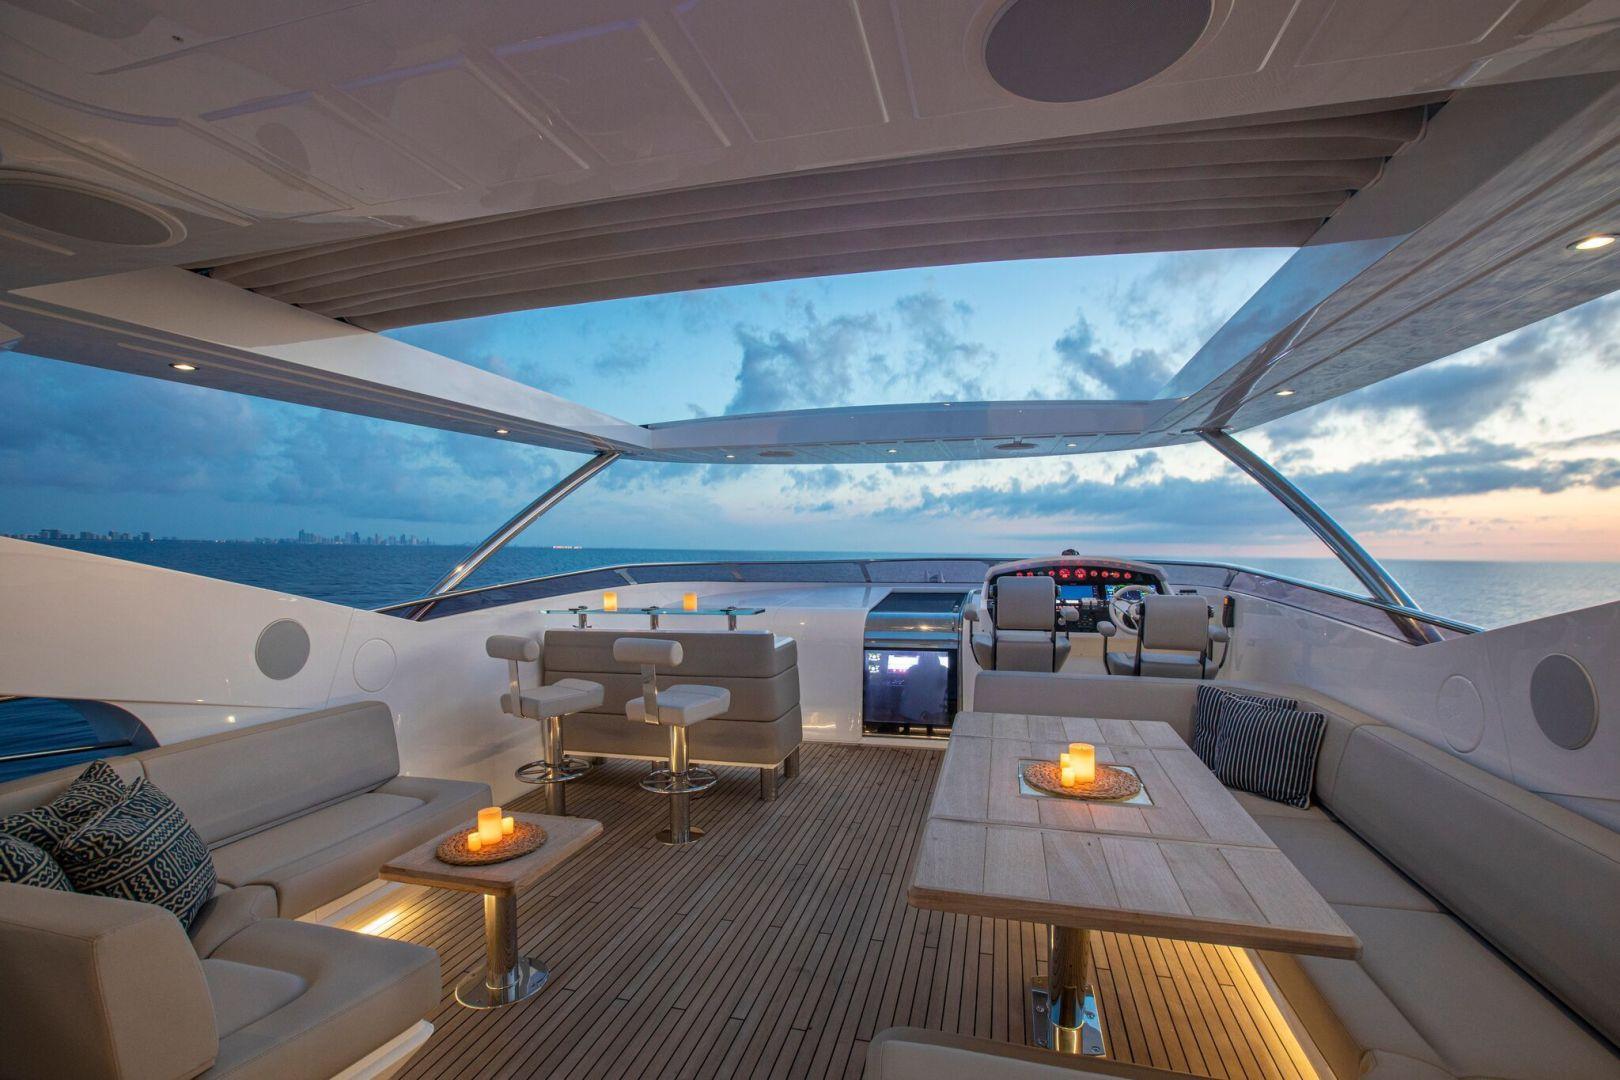 Sunseeker-95 Yacht 2017-Perseverance 3 Ft Lauderdale-Florida-United States-1400086   Thumbnail